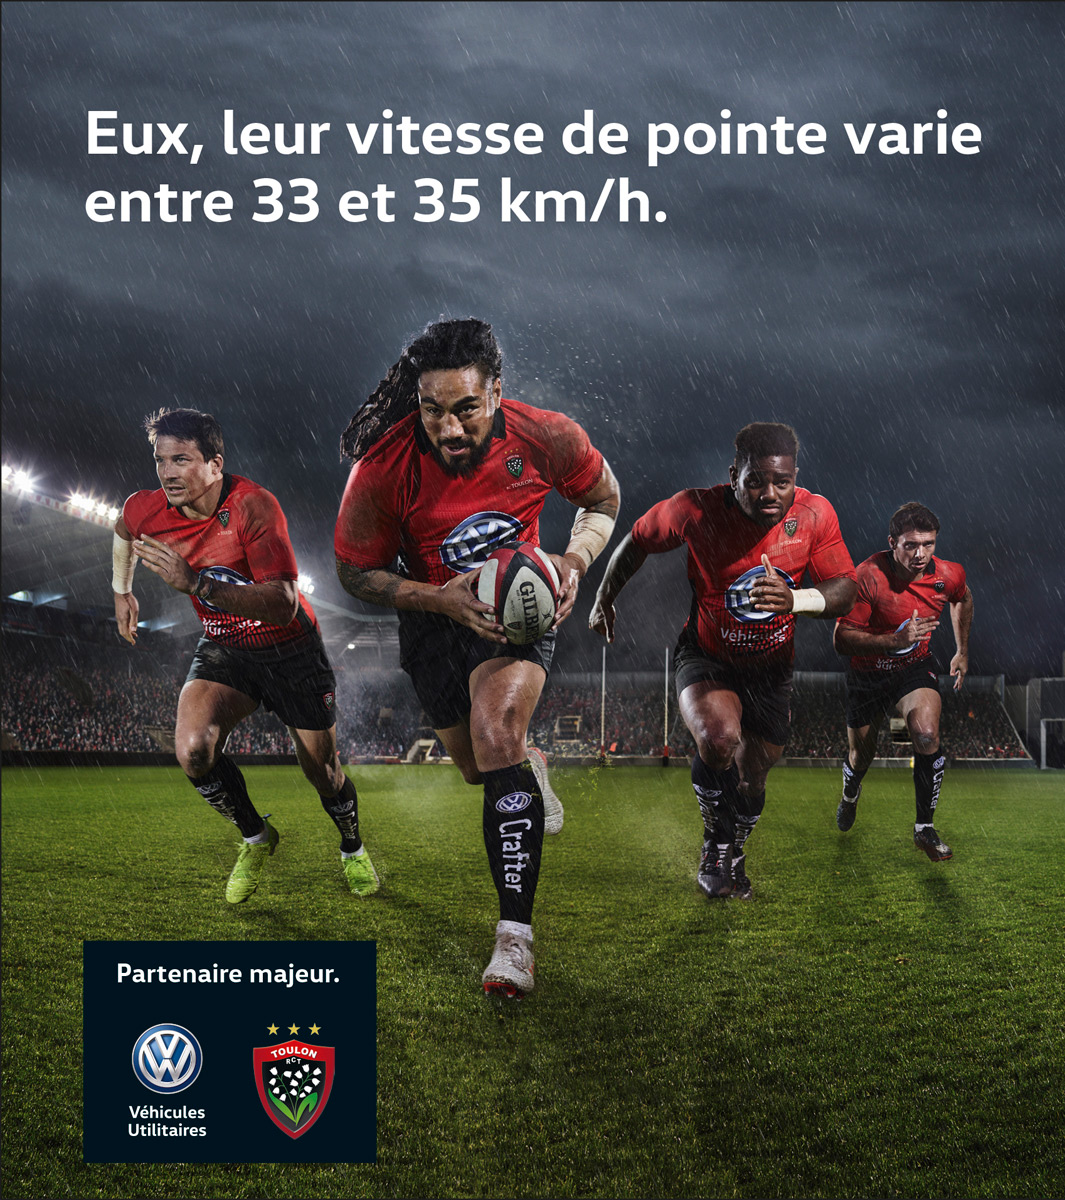 vw_nutzfahrzeuge_rc_toulon_rugby_markus_mueller_france_02.jpg